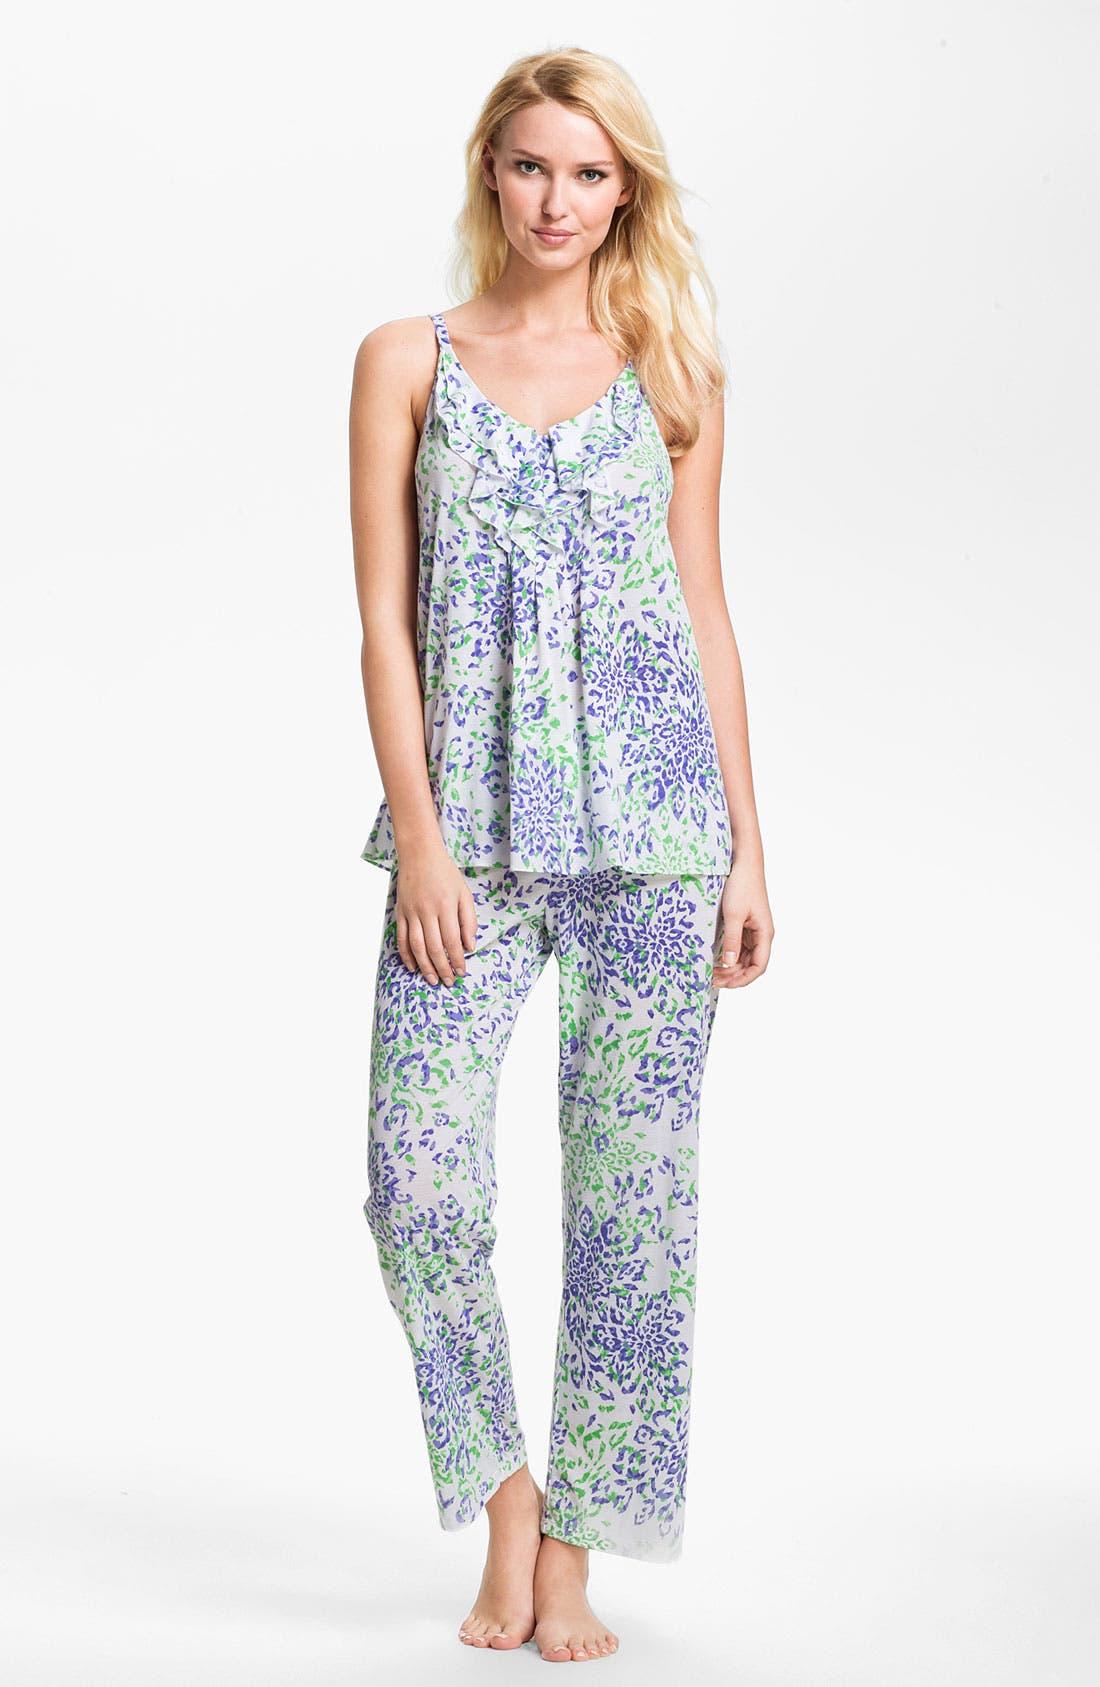 Alternate Image 1 Selected - Oscar de la Renta Sleepwear 'Animal Blossom' Print Pajamas